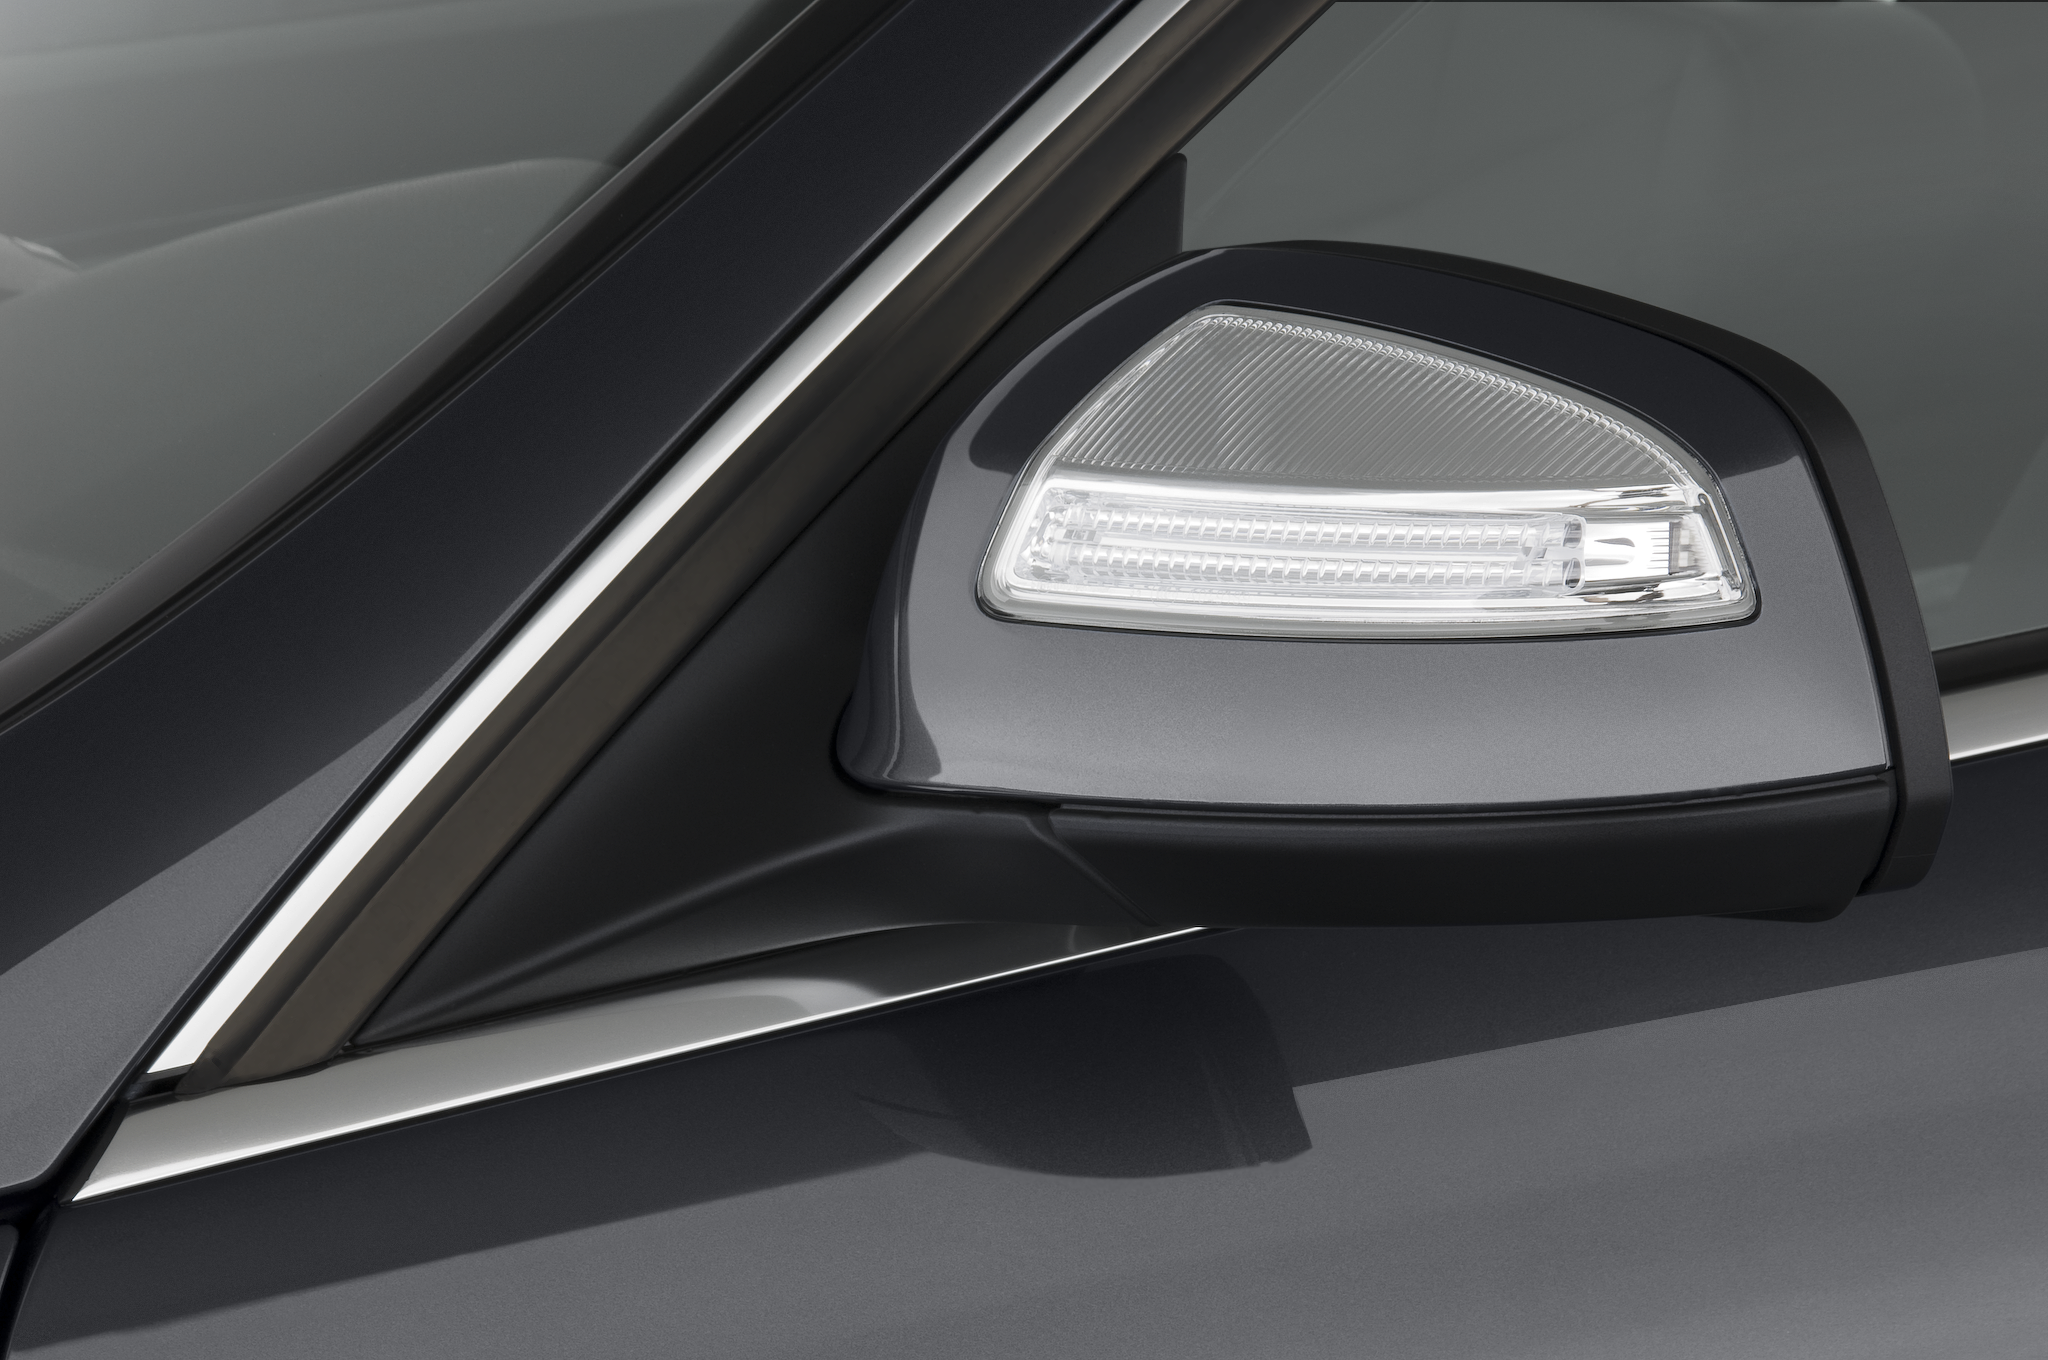 2010 mercedes benz c63 amg automobile magazine for Mercedes benz mirror